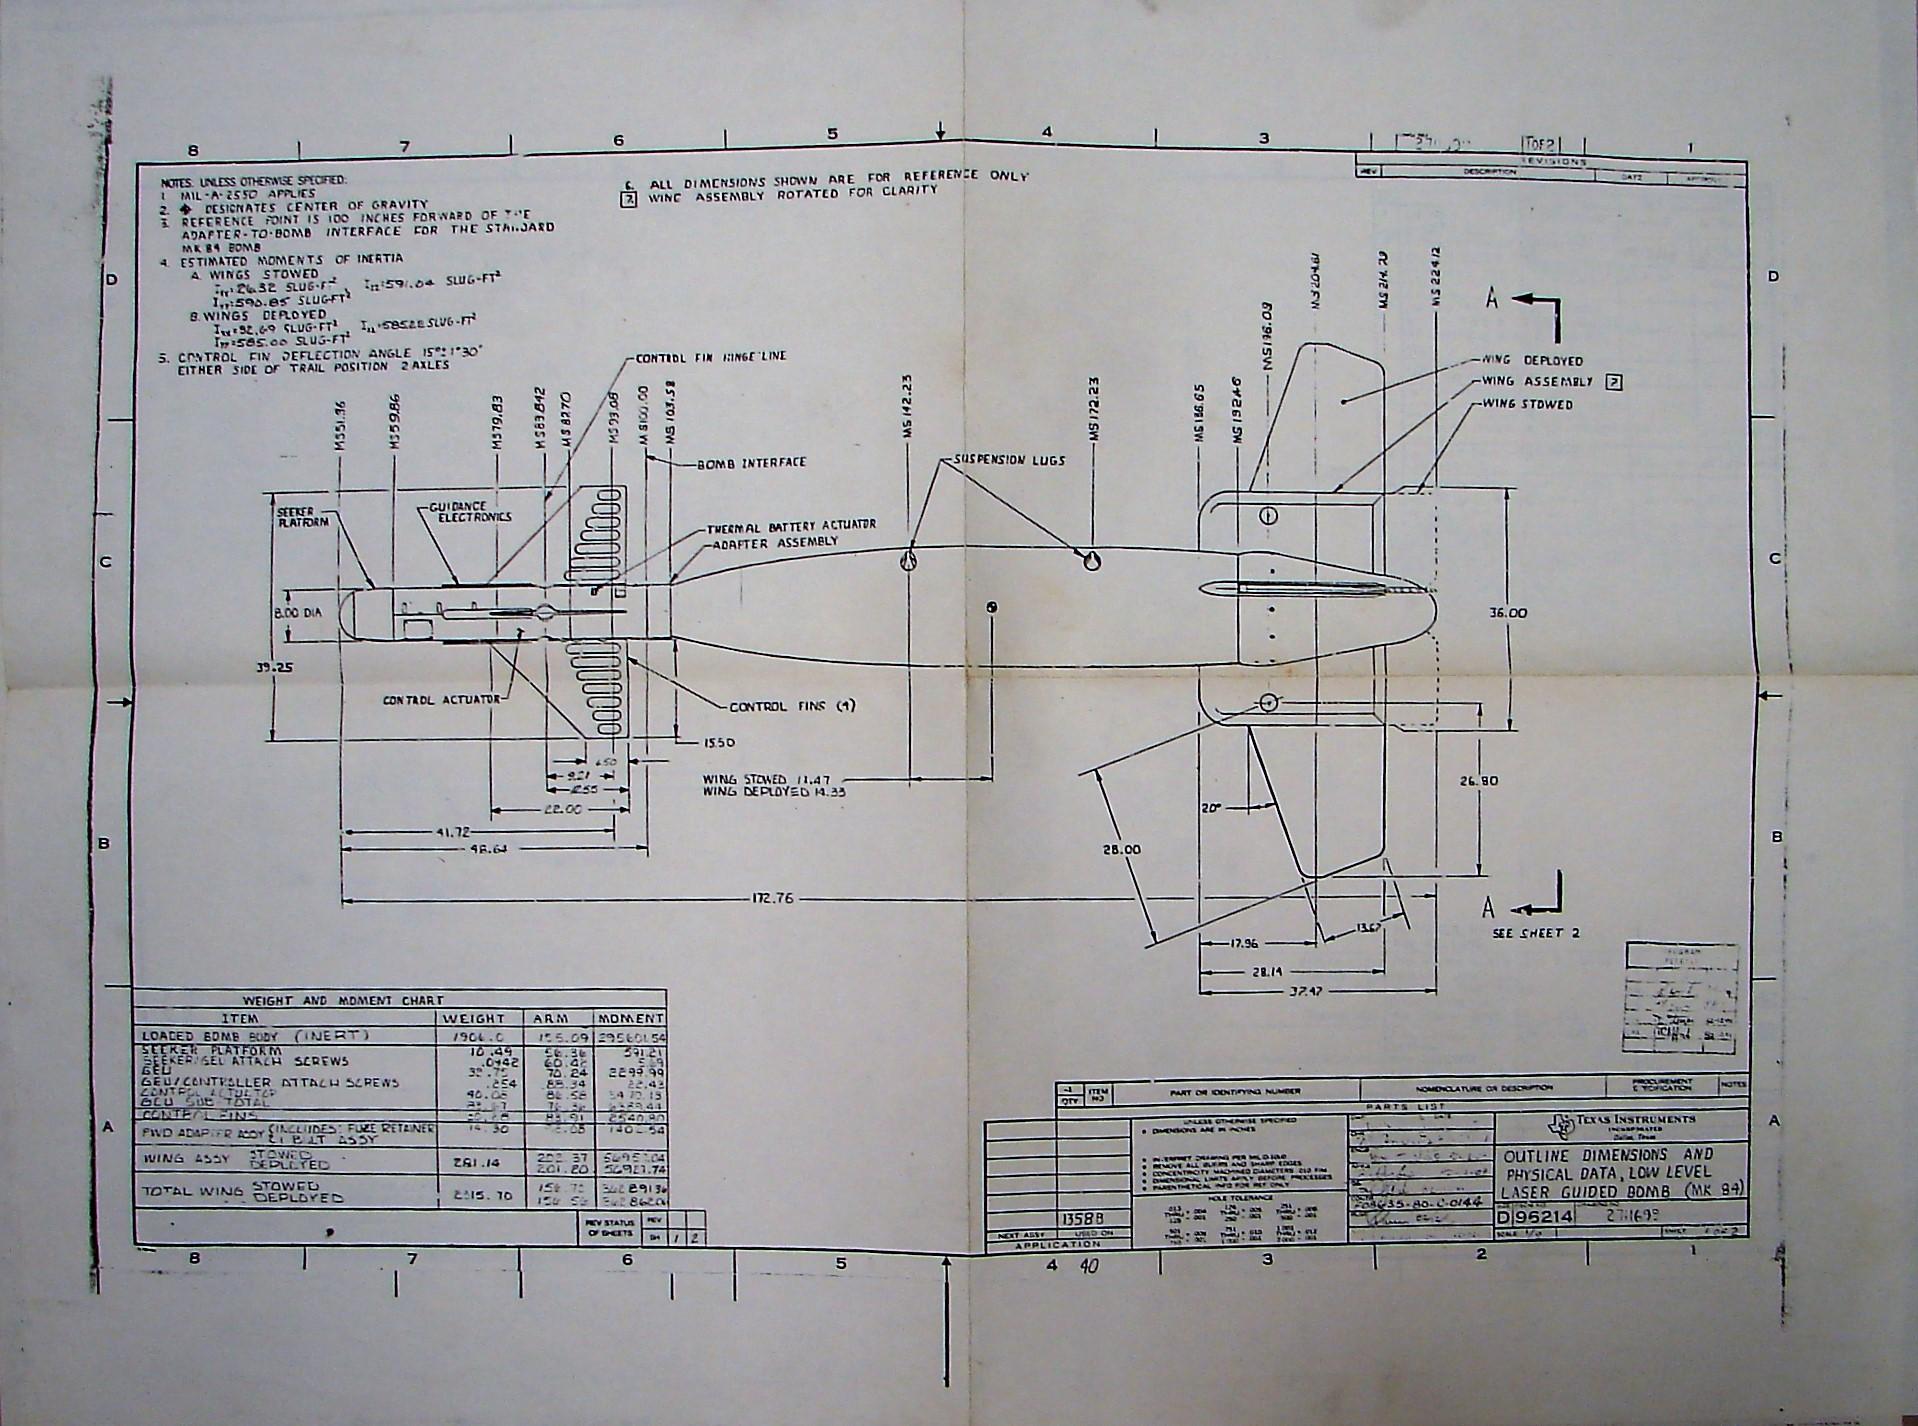 TI MK 84 LGB Schematic